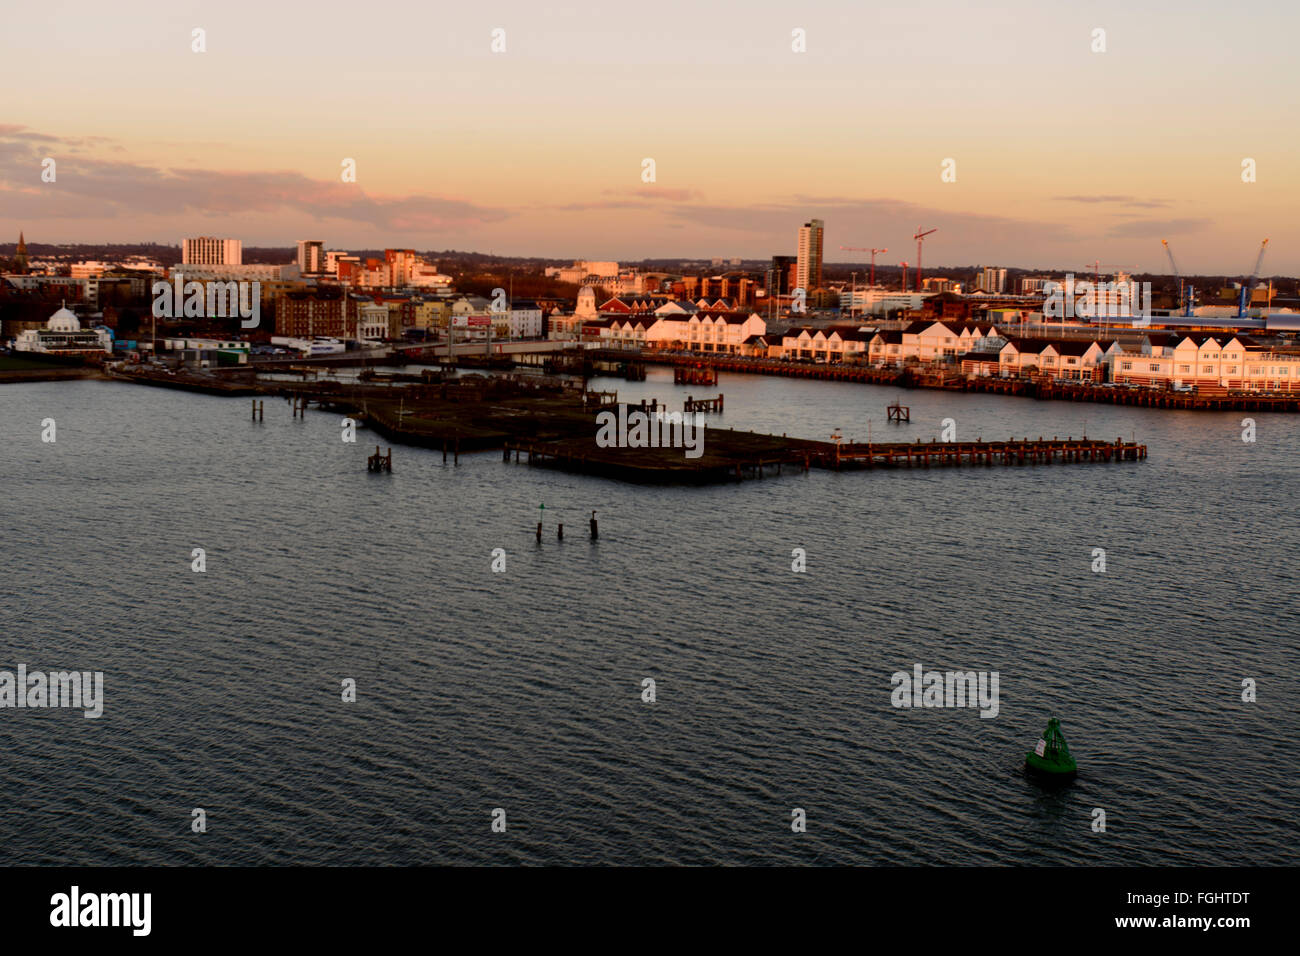 Southampton harbour - Stock Image